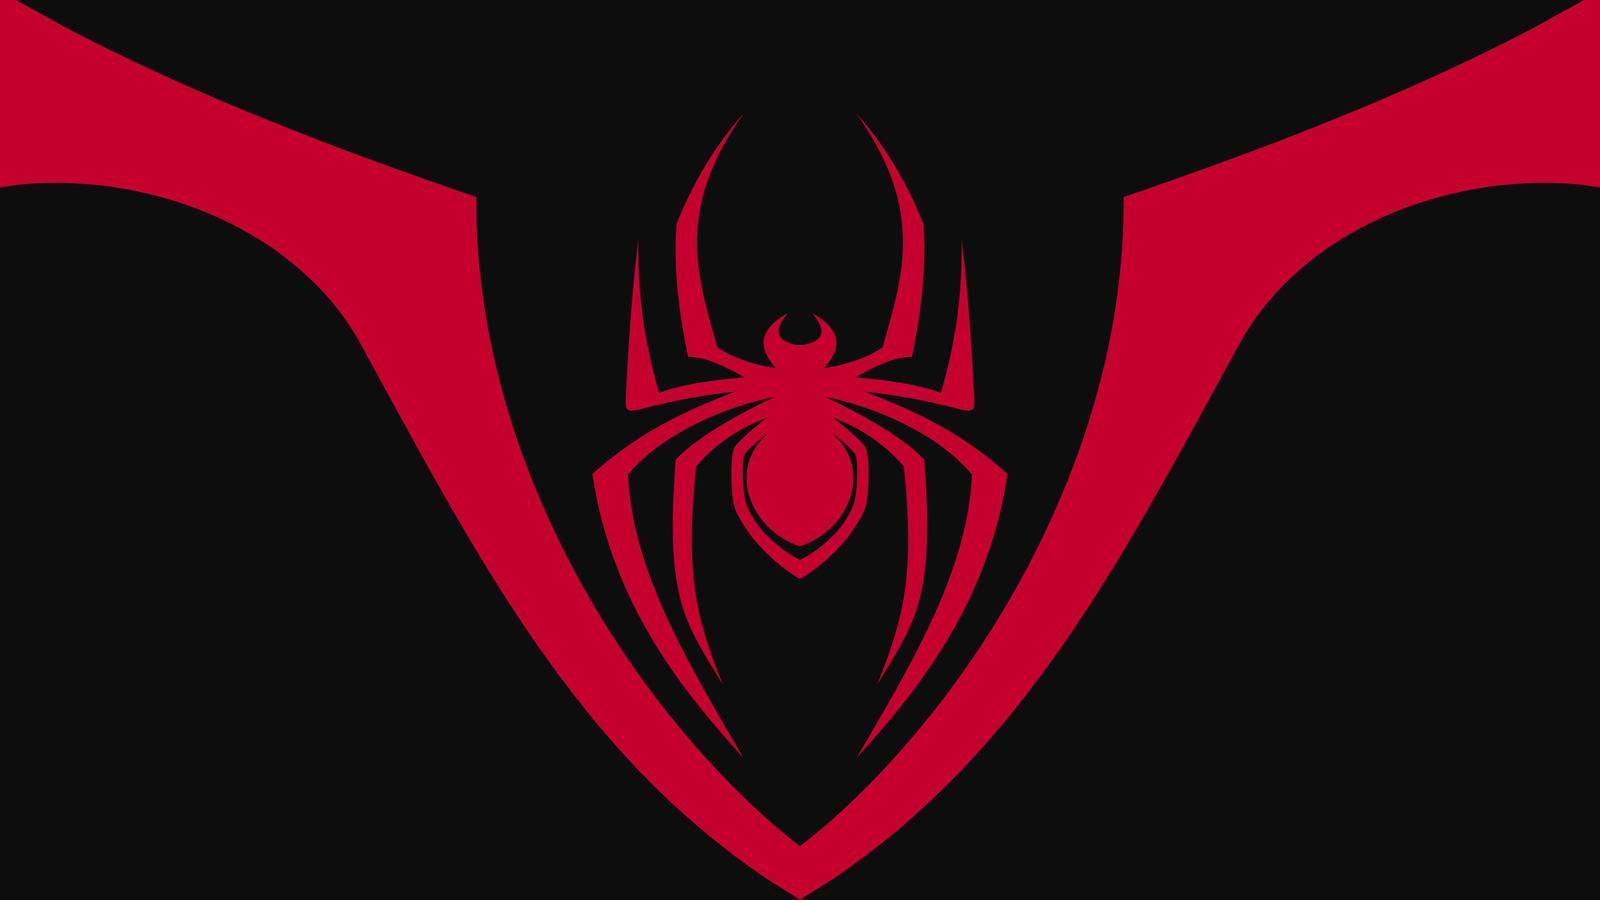 Spiderman back emblem